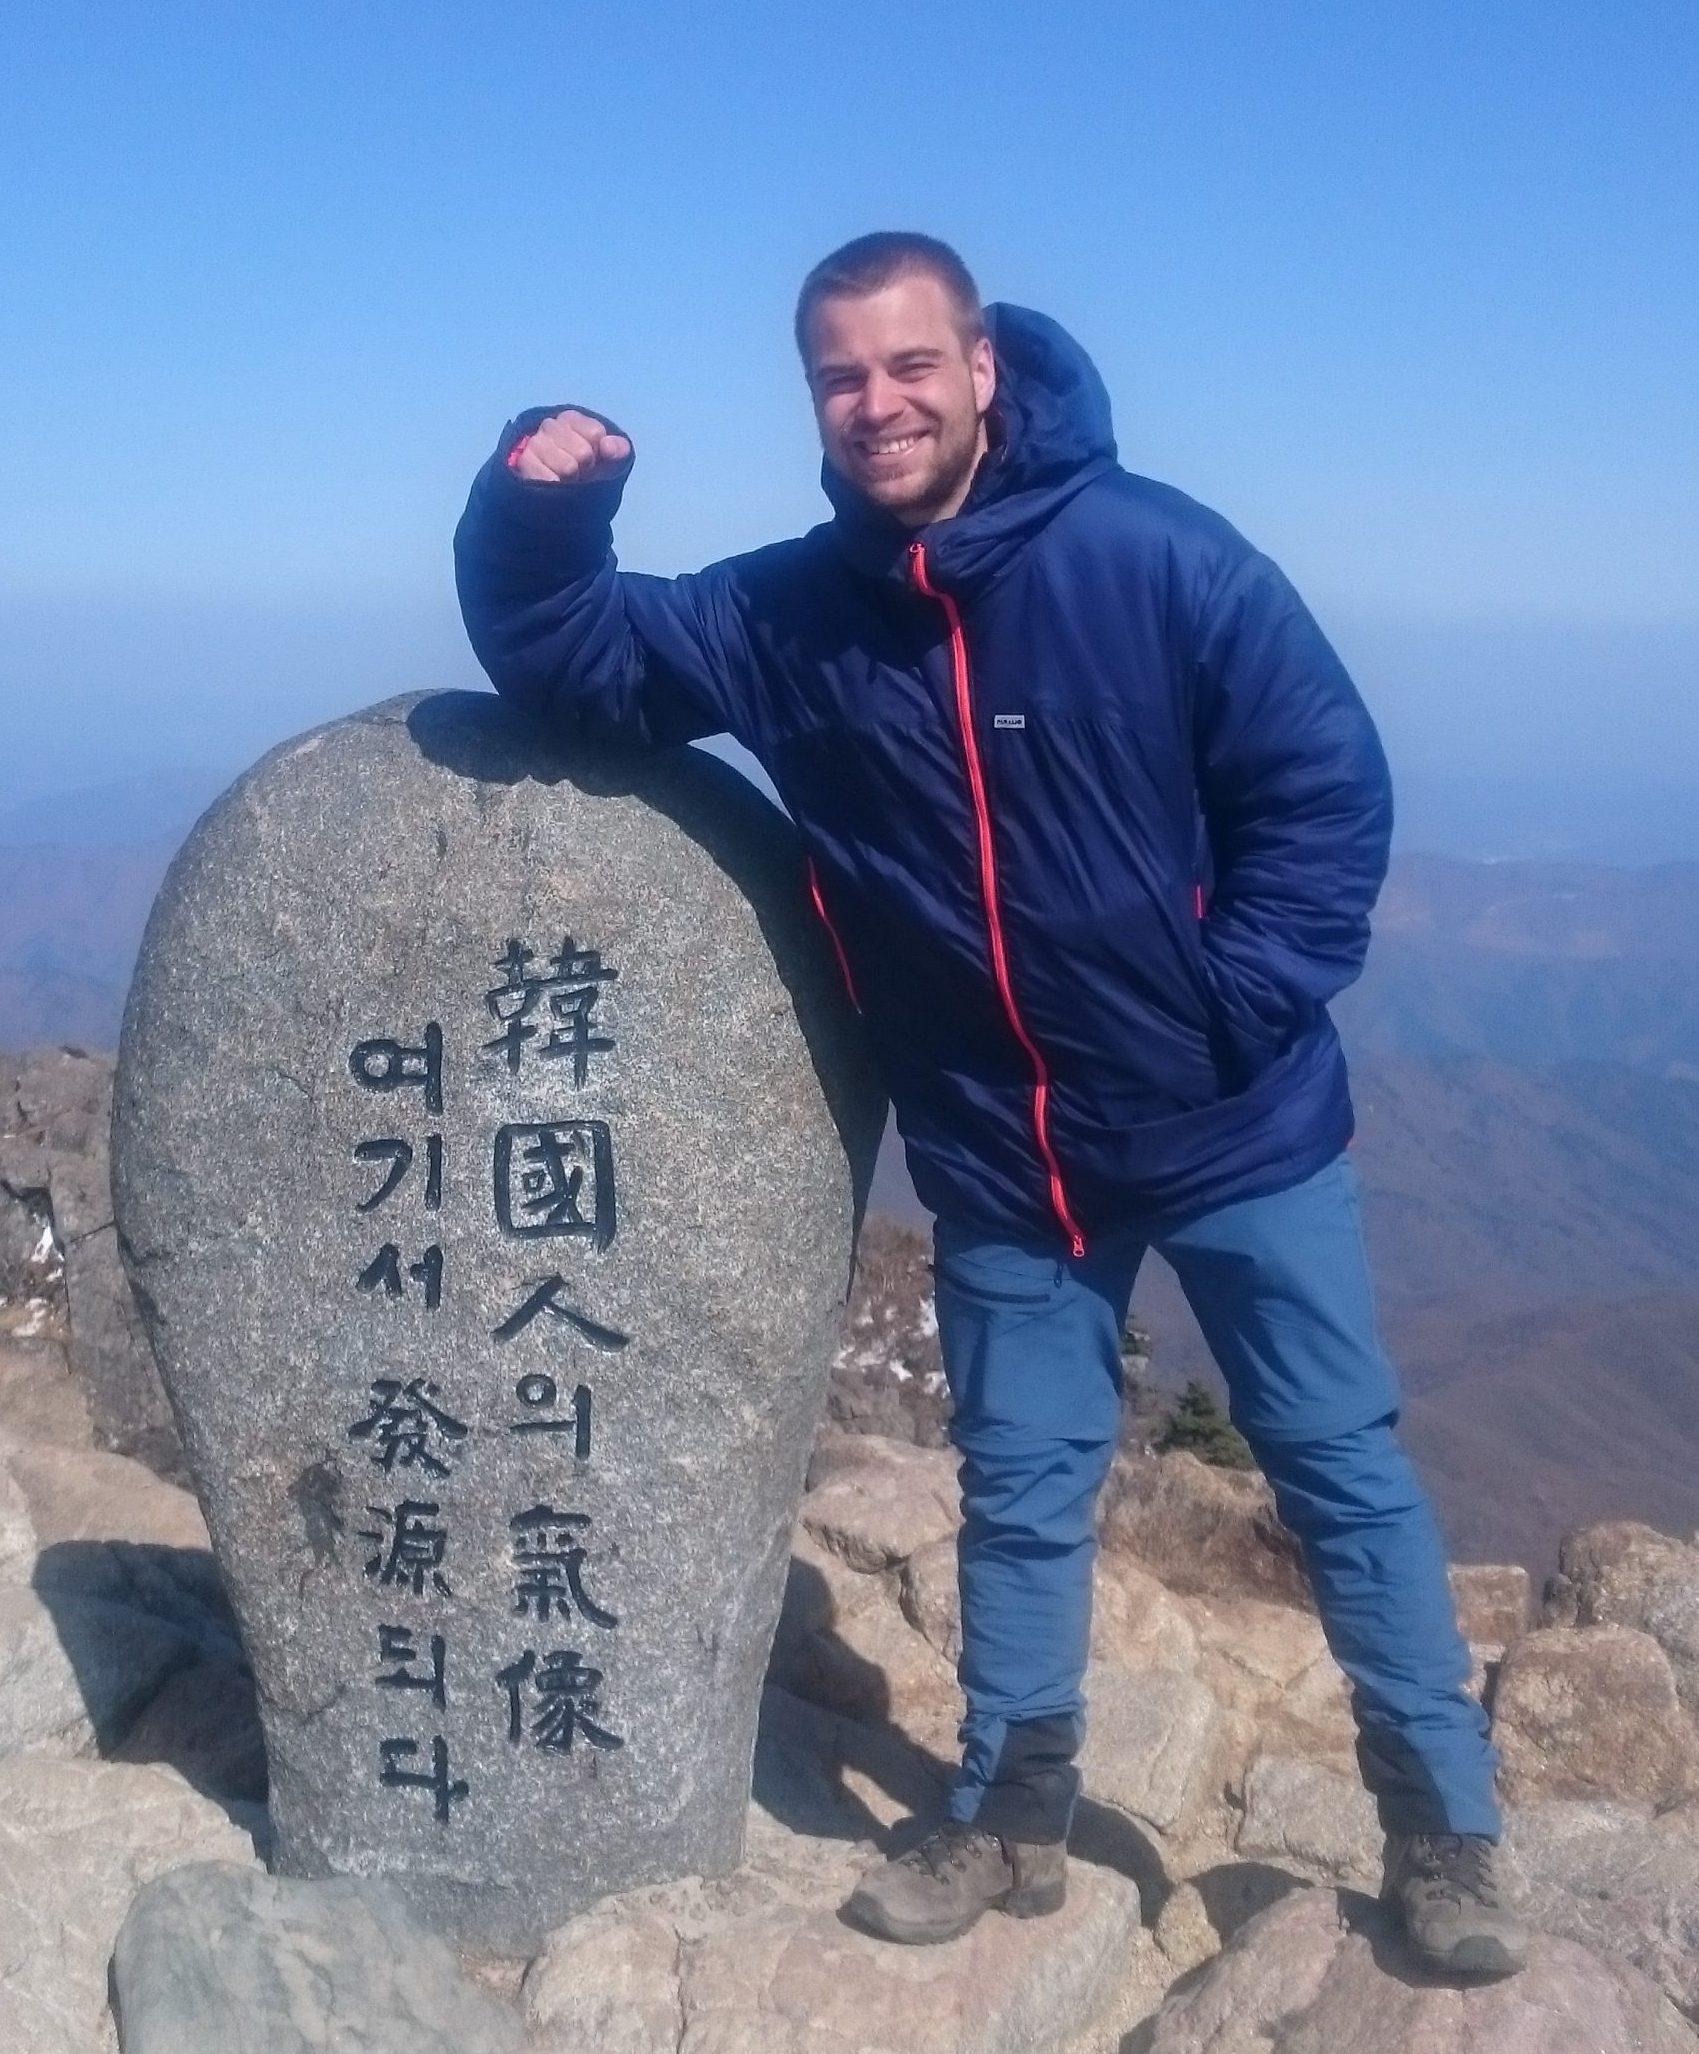 Paramo Torres Alturo Midnight Jacket - Cheonwangbong Peak im Jirisan National Park (Südkorea)